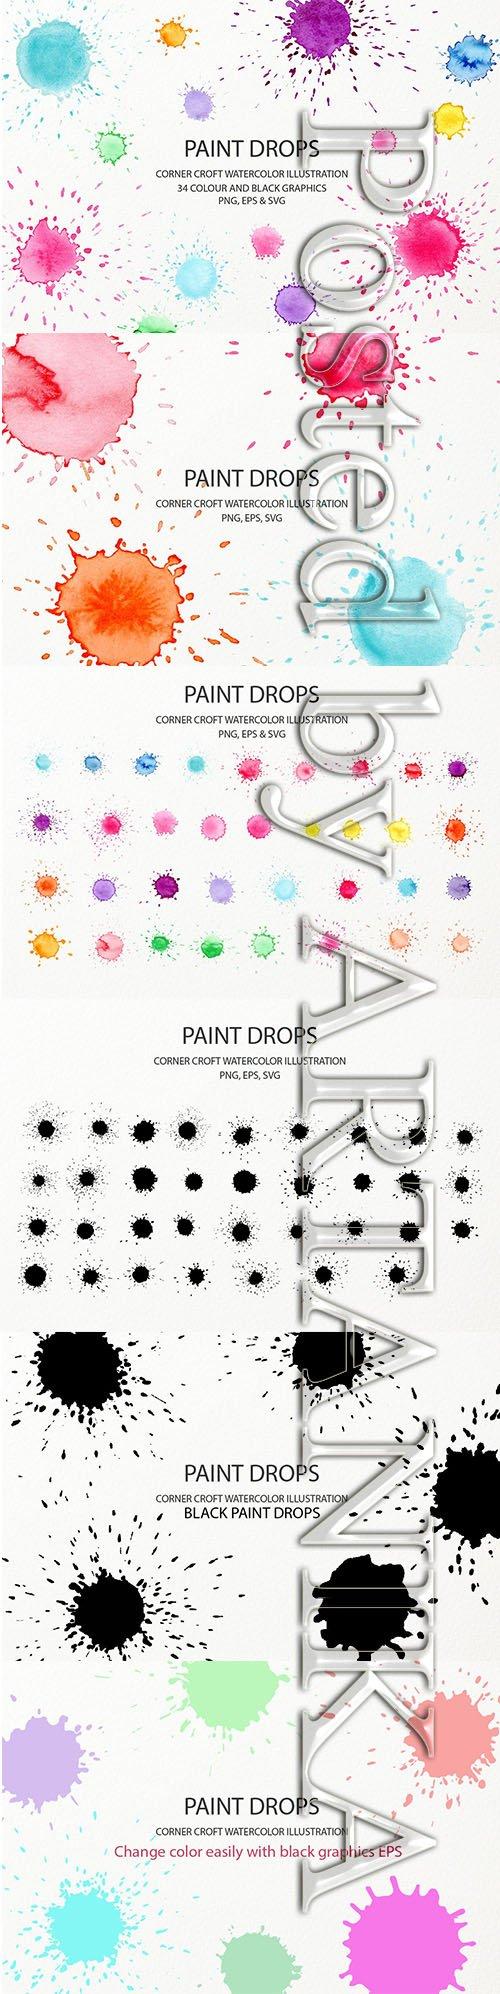 Watercolor Paint Drop Collection